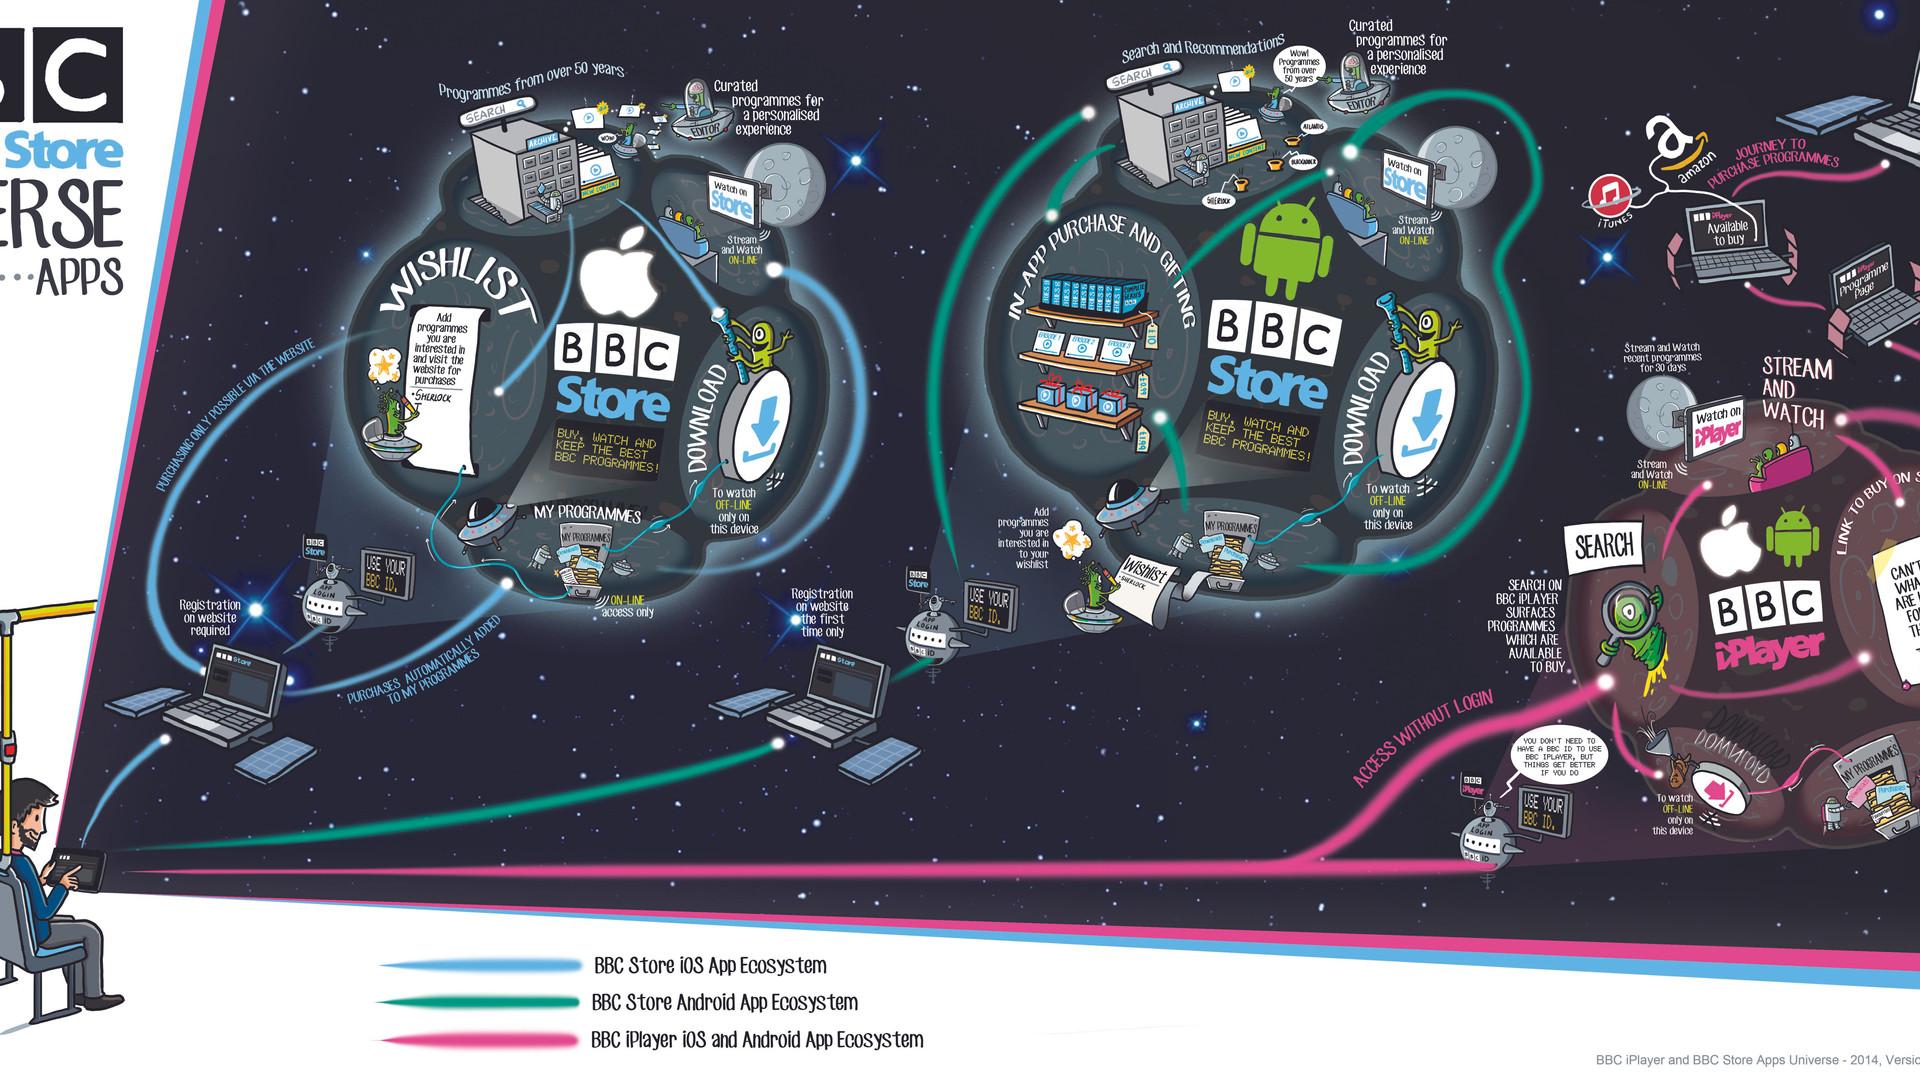 BBC iPlayer & BBC Store Apps Universe .j